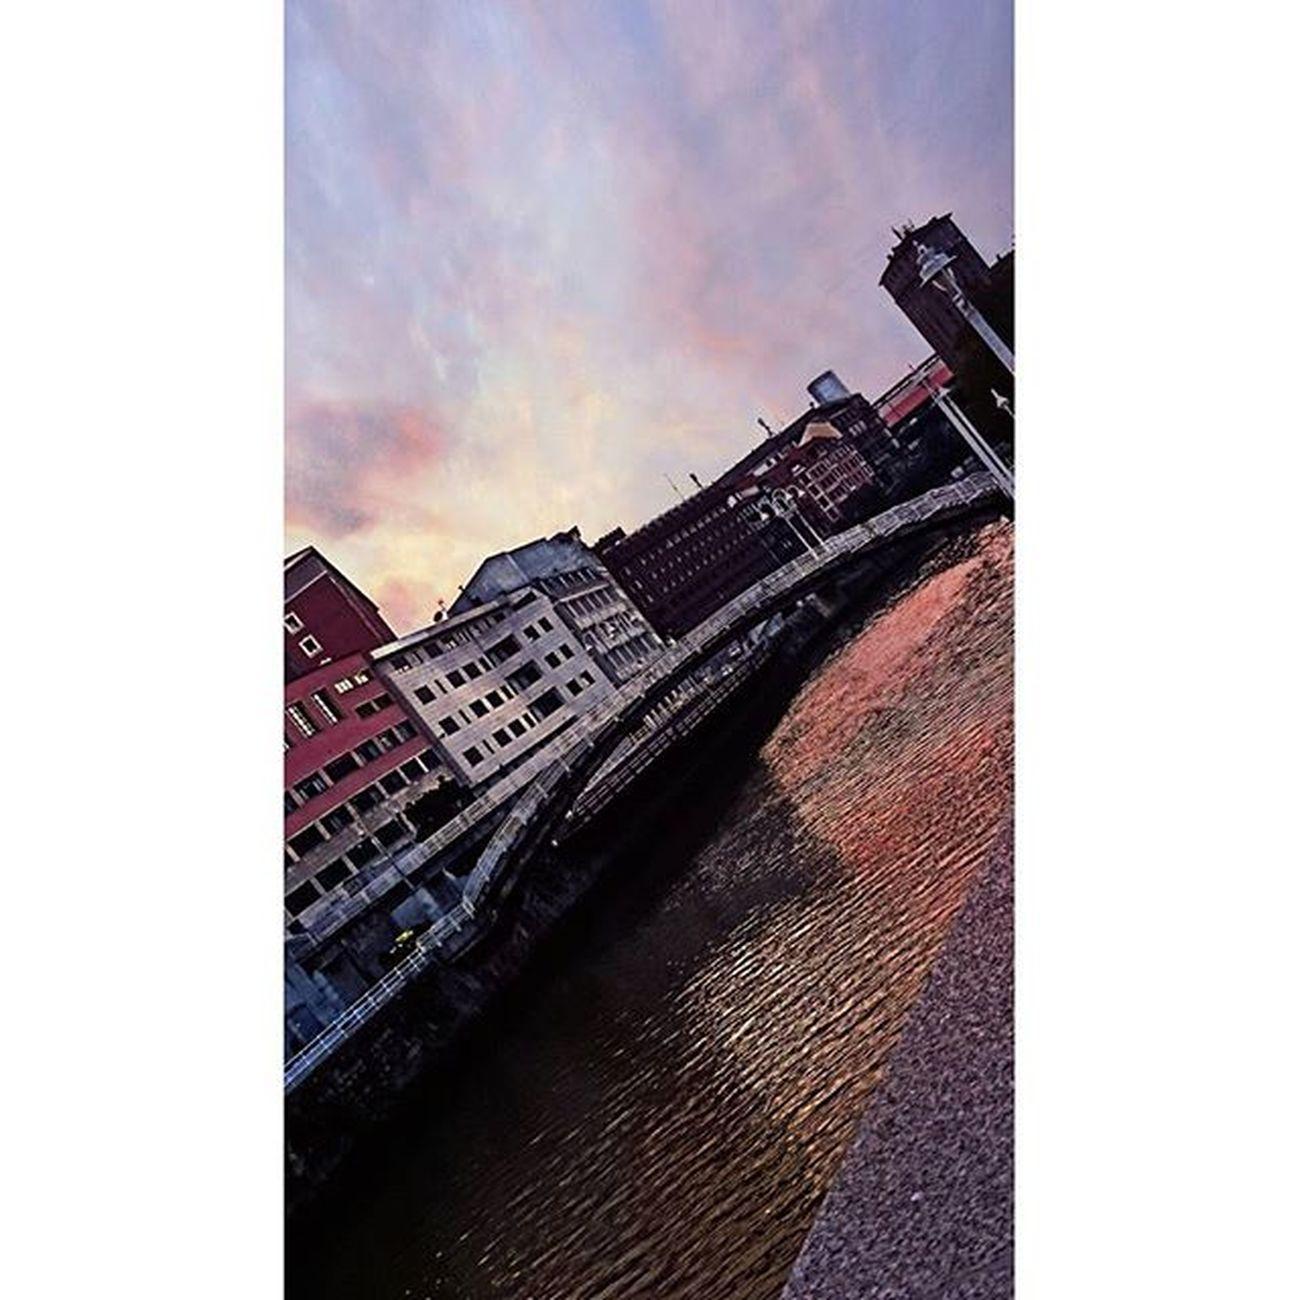 Sunset in Martzana, Bilbao Verybilbao Visitbilbao Visitbasquecountry Bilbao Bilbaolovers Ilovebilbao Bilbaosoul Bilbaoshare Guidedupaysbasque Sorginzulo Sunset SummerNights Summerweather Sky Landscape Landscape_lovers Igersoftheday Igers Igersbilbo Euskogram Euskadi Euskadibasquecountry Euskadigrafias Hotelmirobilbao All_shots like4like picoftheday photooftheday turismobilbao turismobizkaia